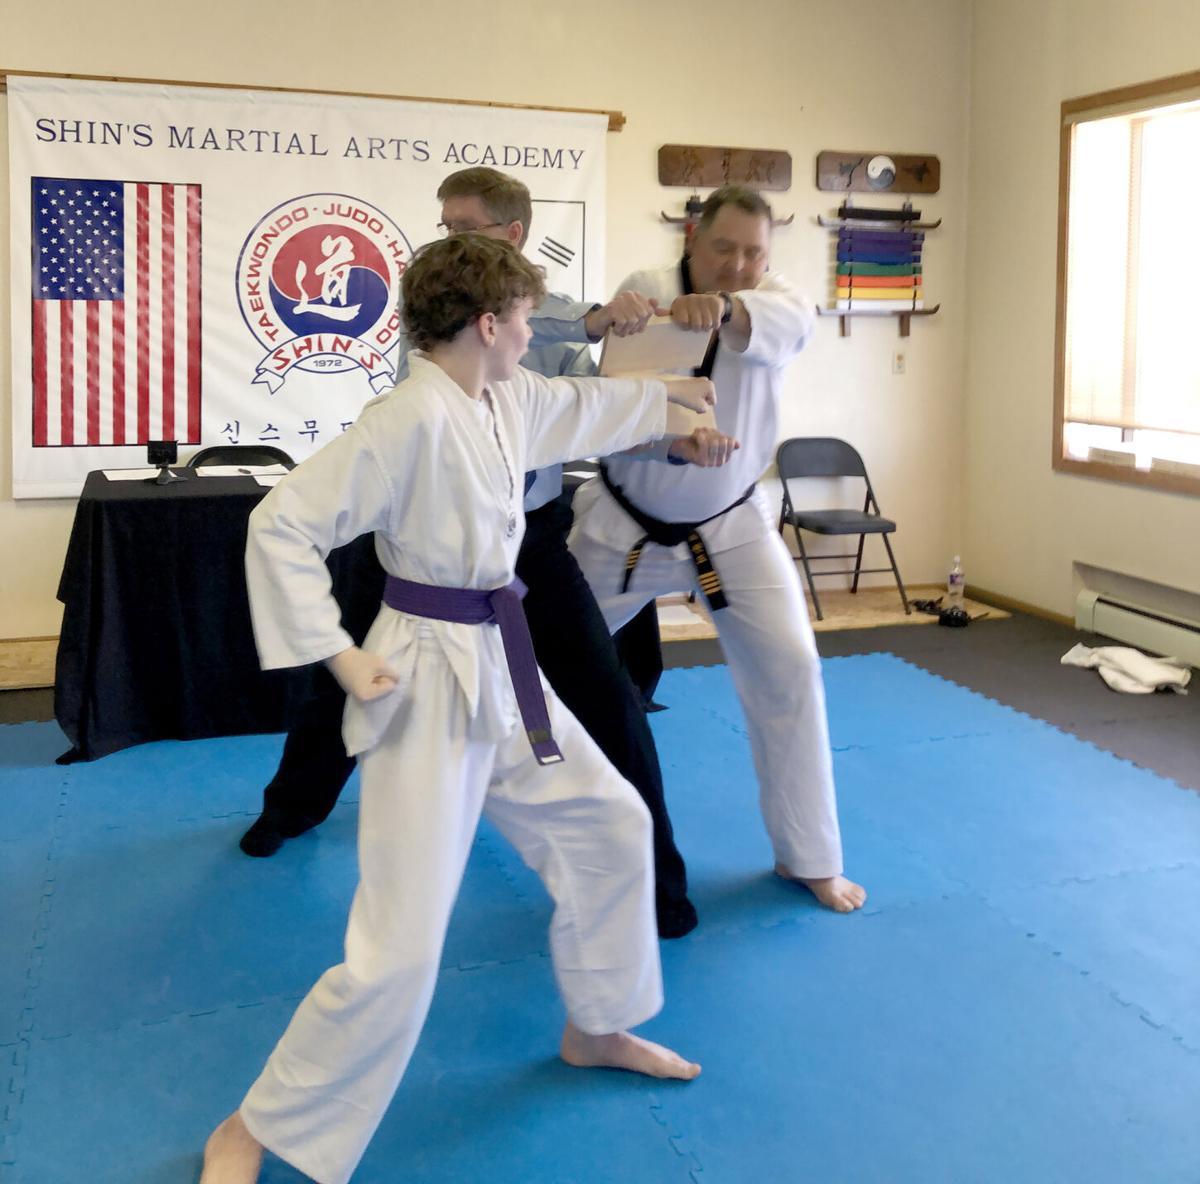 tae kwon do sander1 21-04-28s